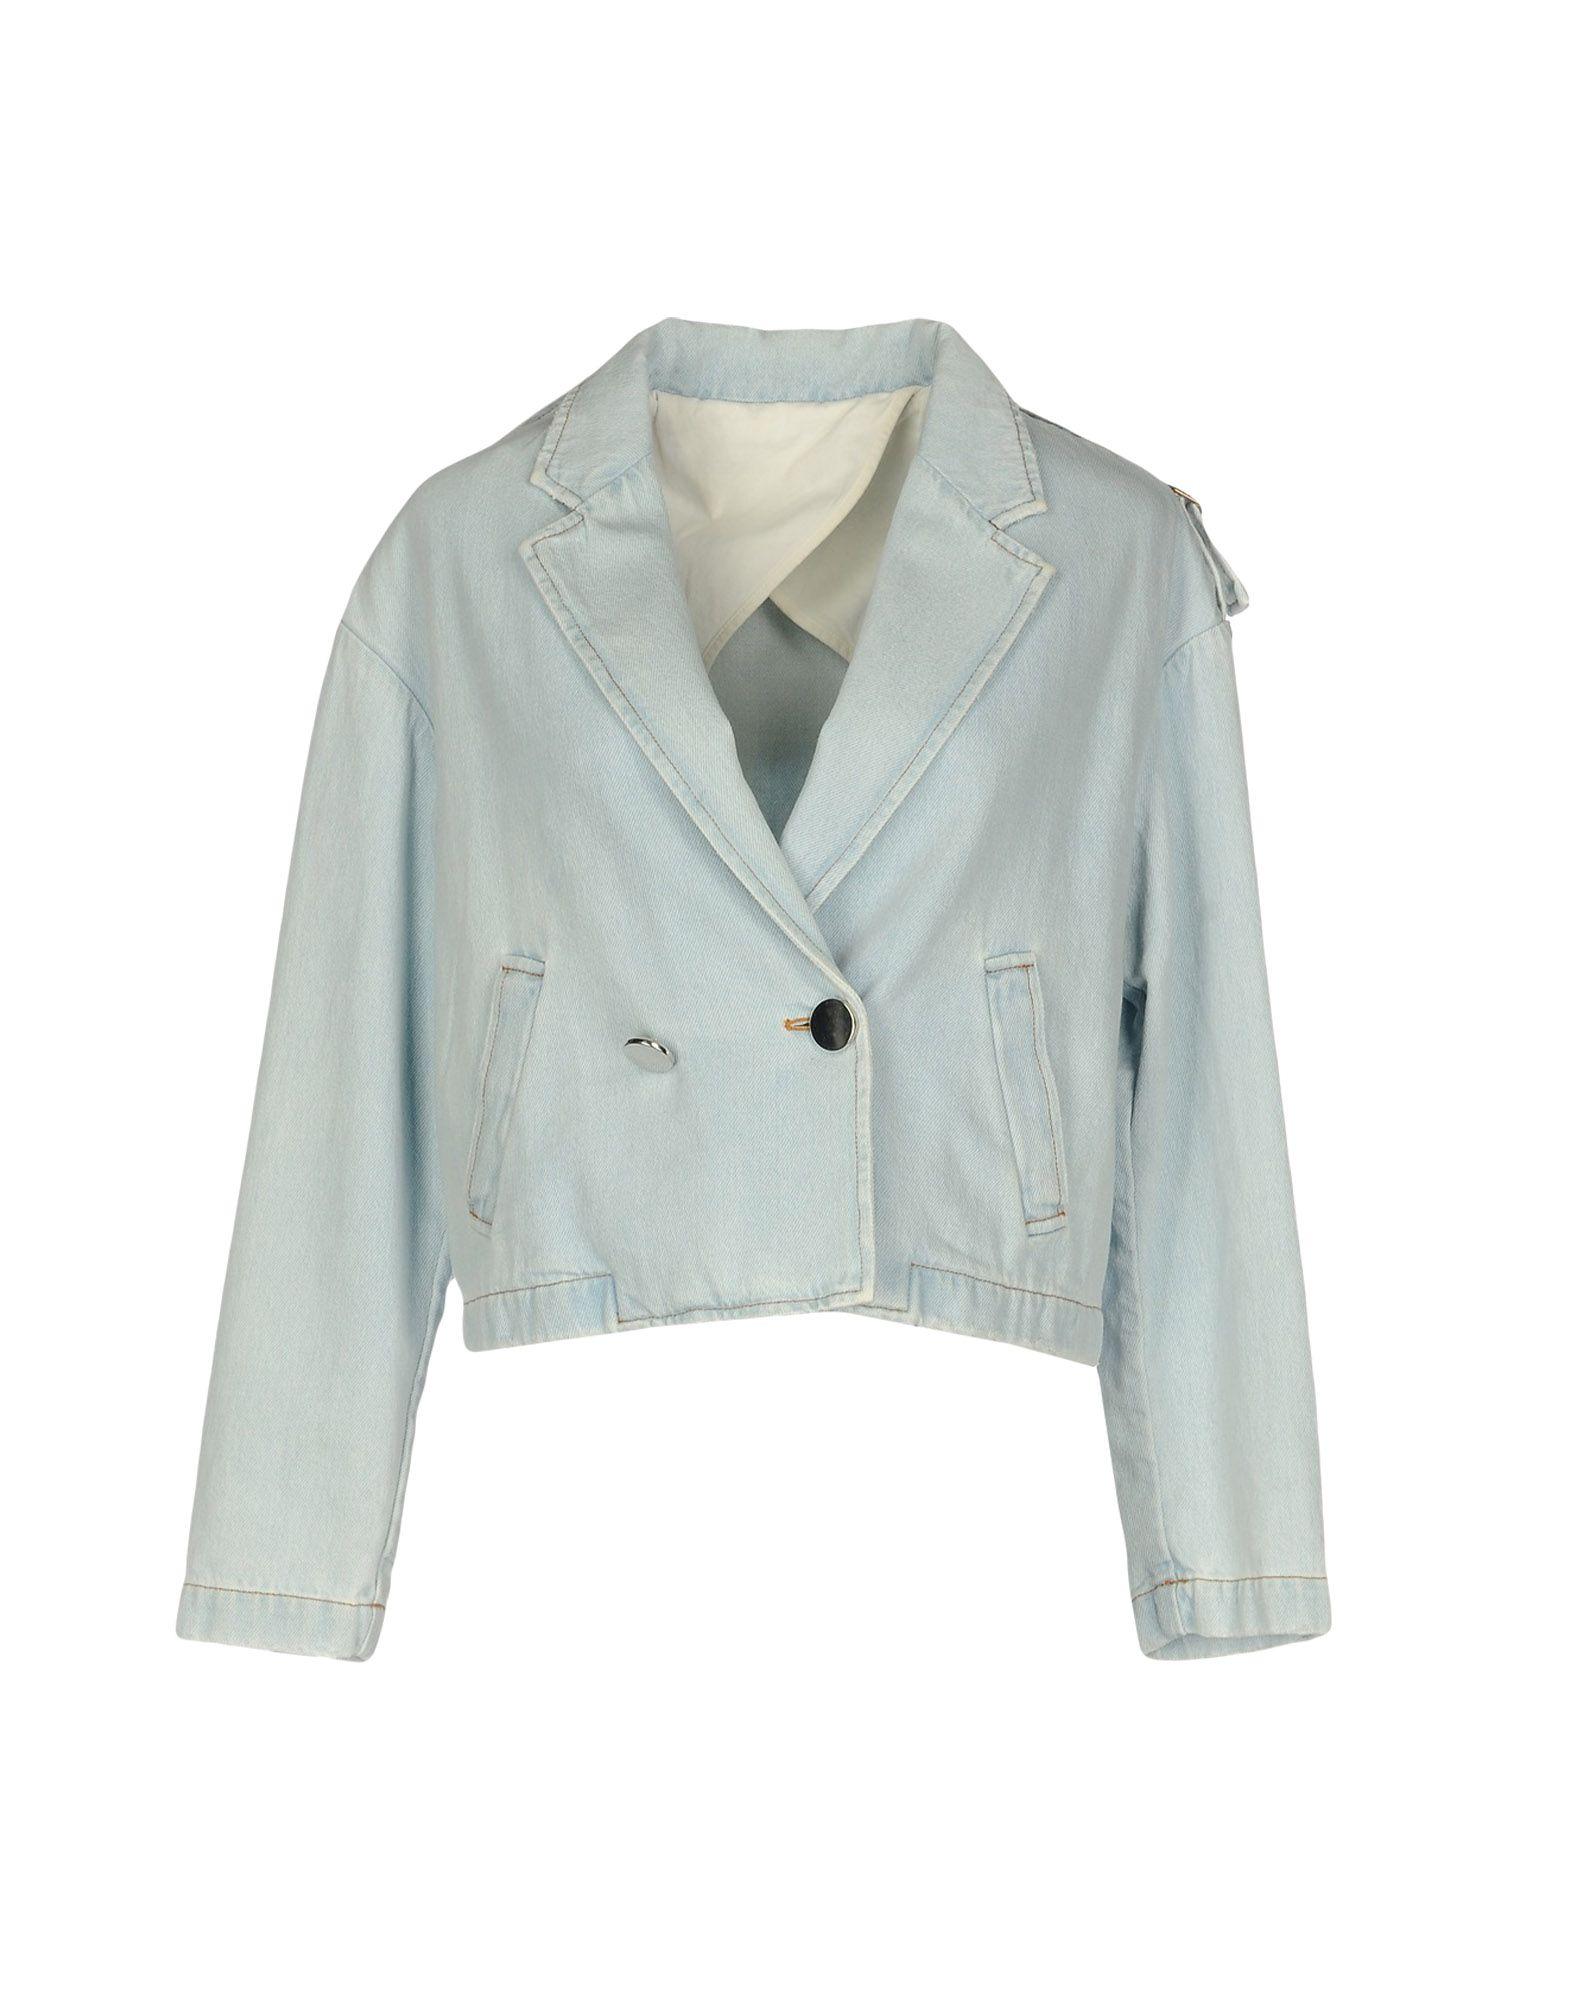 MAURO GRIFONI Джинсовая верхняя одежда wood wood джинсовая верхняя одежда